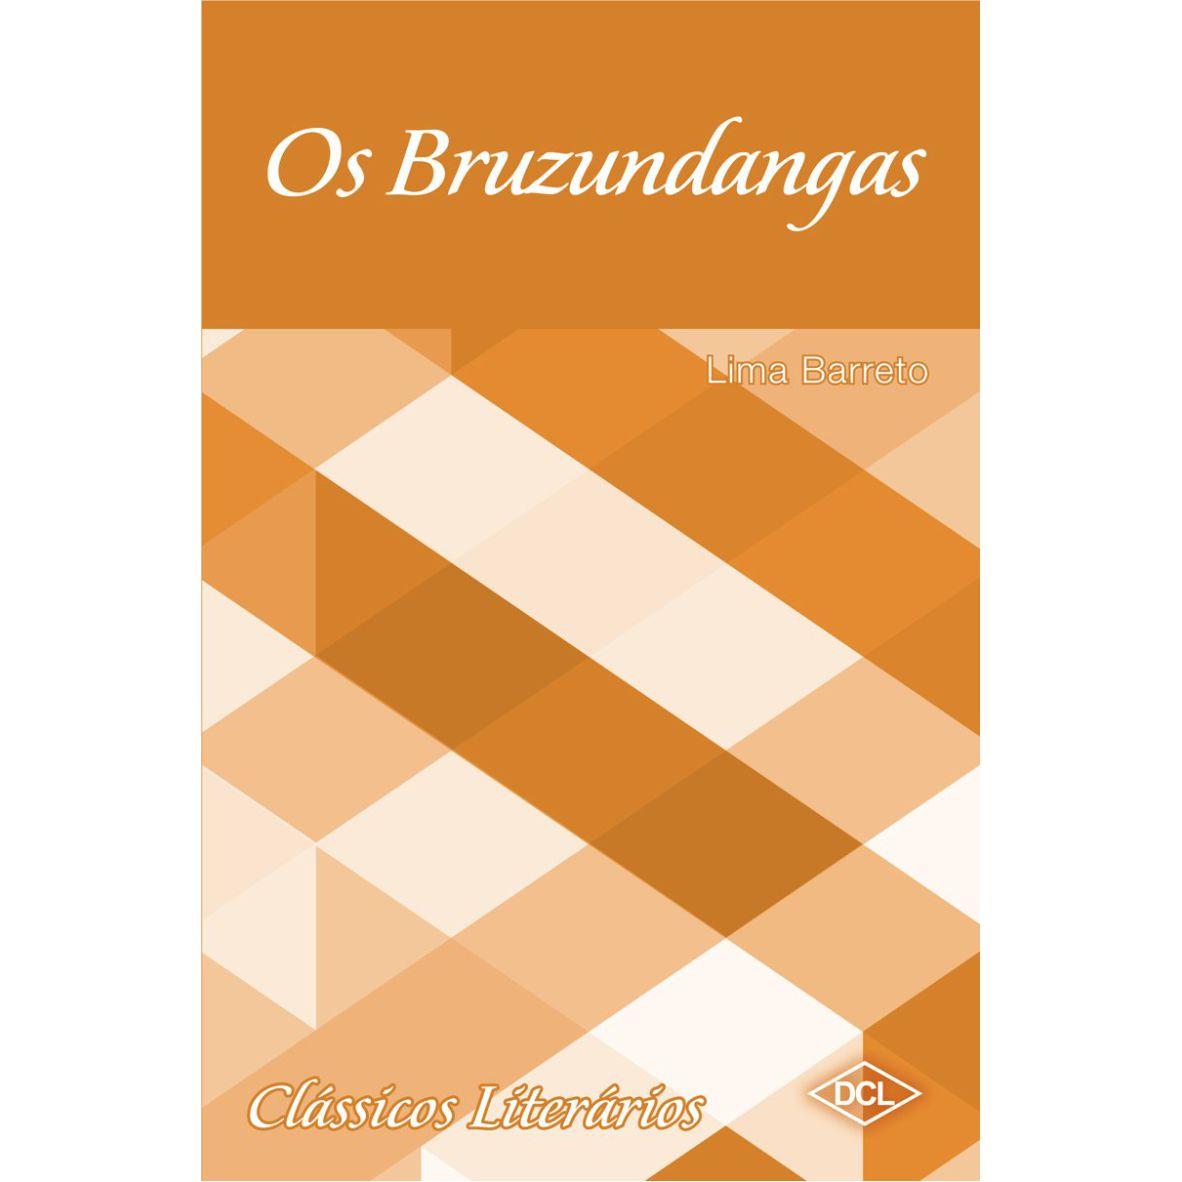 Livro Os Bruzundangas - Editora DCL